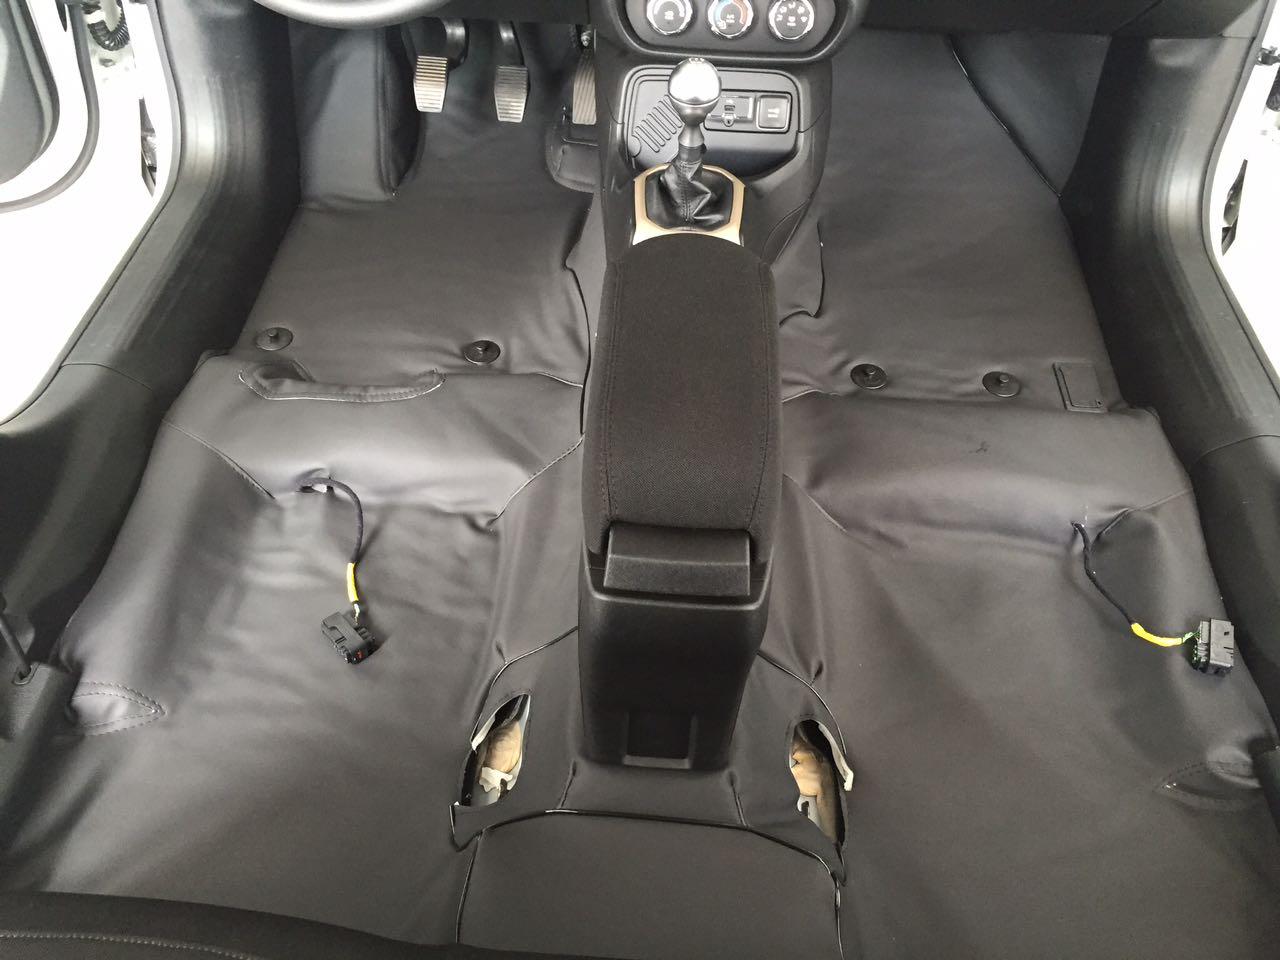 tapete Super Luxo Automotivo Assoalho ford Corcel 1 e 2